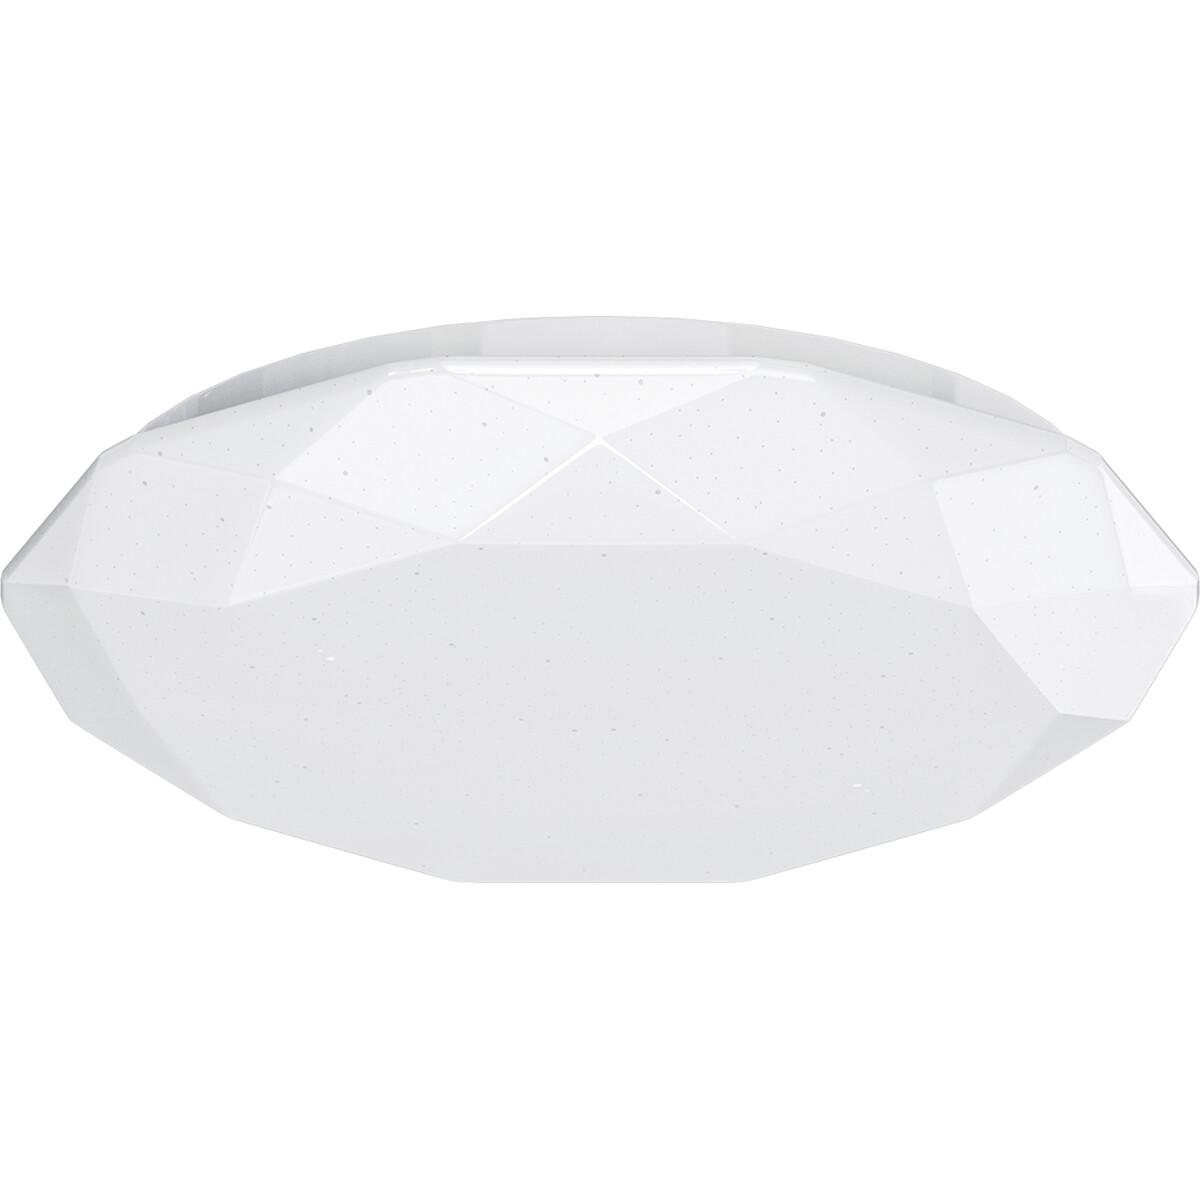 LED Plafondlamp - Aigi Dian - Opbouw Rond 20W - Warm Wit 3000K - Mat Wit - Aluminium